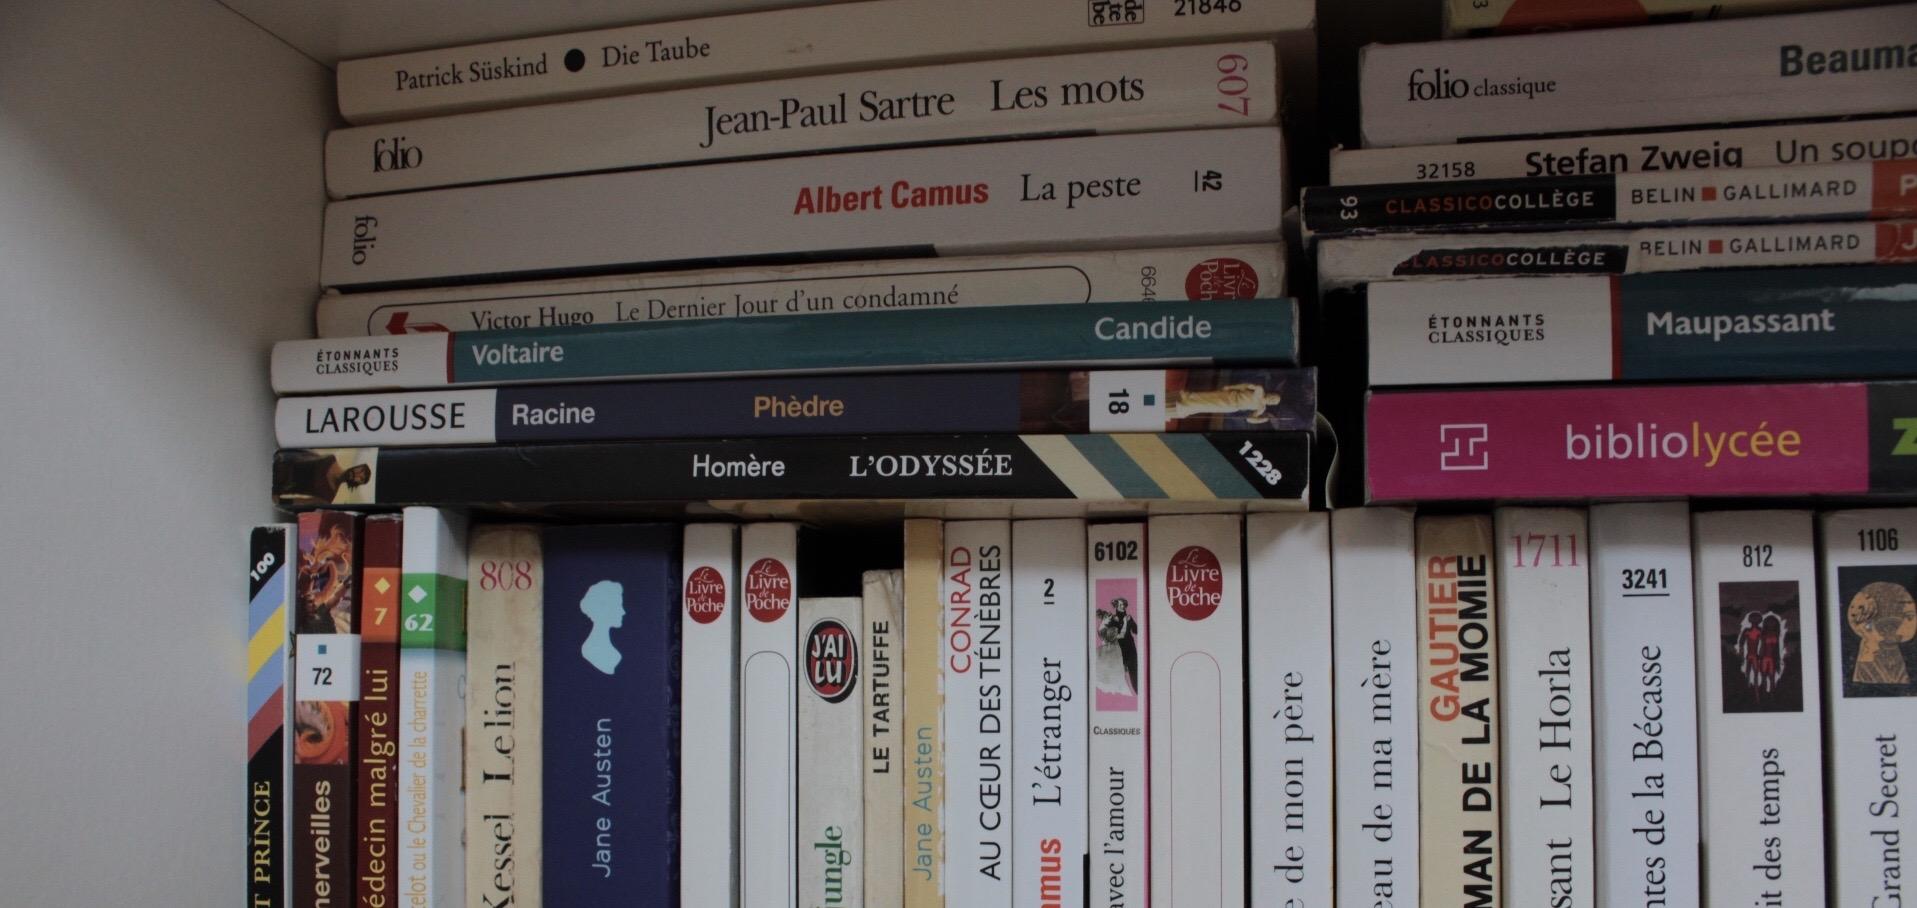 Bibliothèque Julie